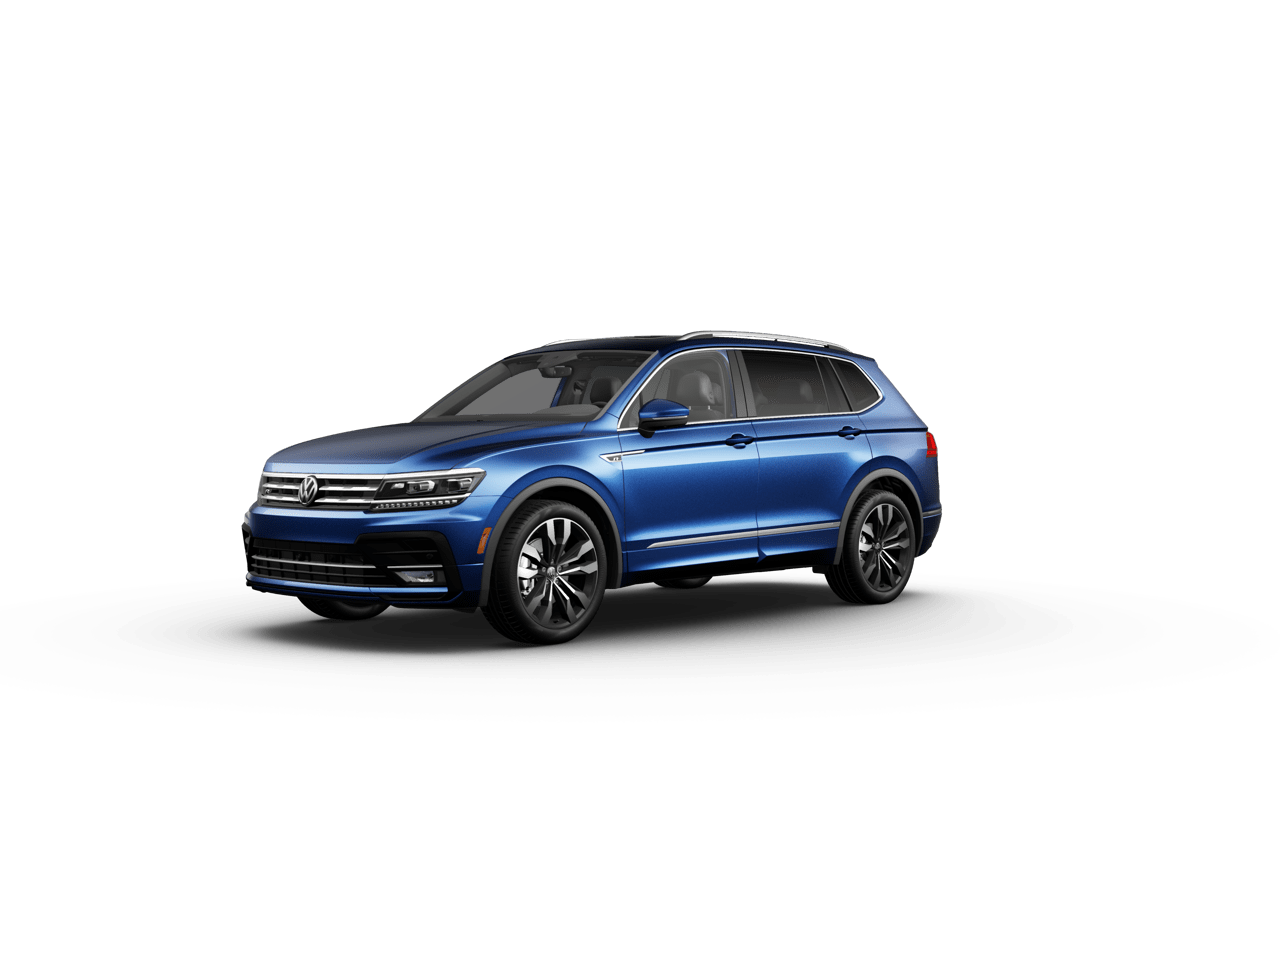 2020 Volkswagen Tiguan Silk Blue Metallic O Neftin Westlake Volkswagen